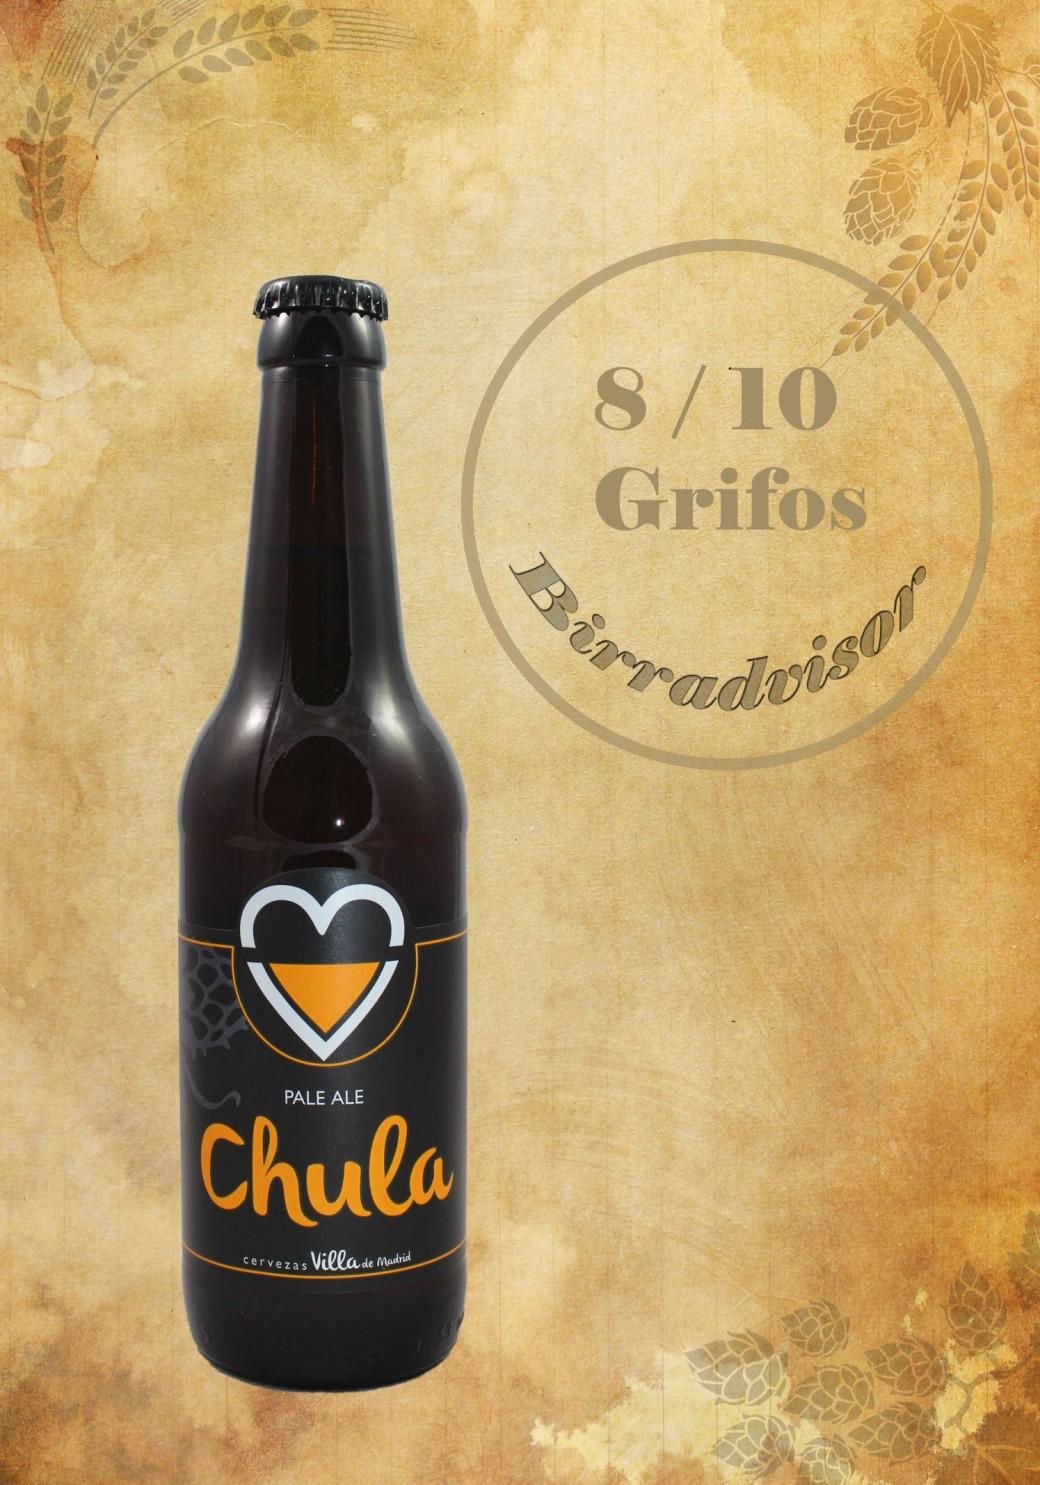 chula (pale ale).jpg